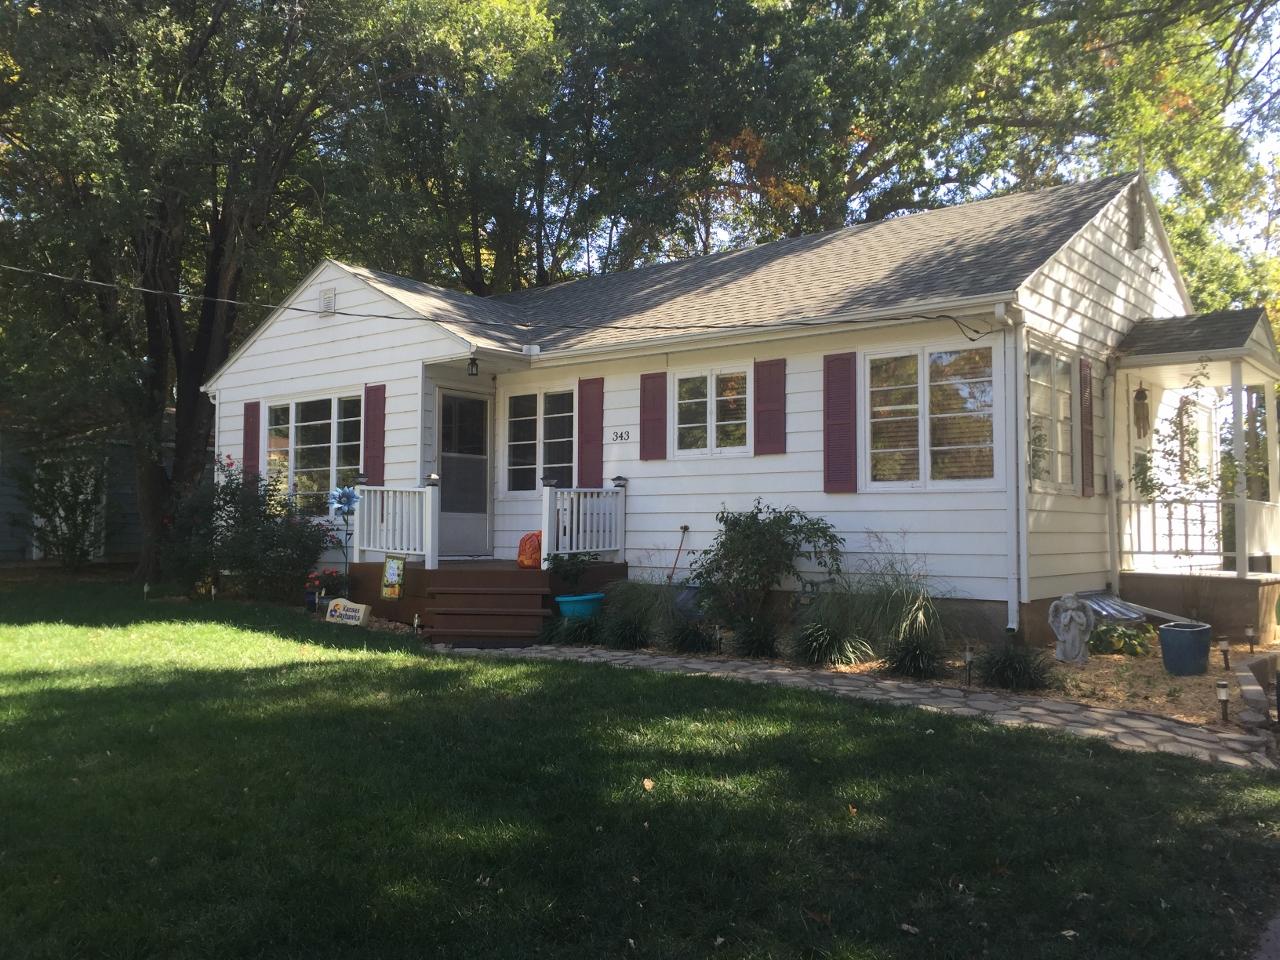 343 W 2nd Ave, Buhler, Kansas 67522